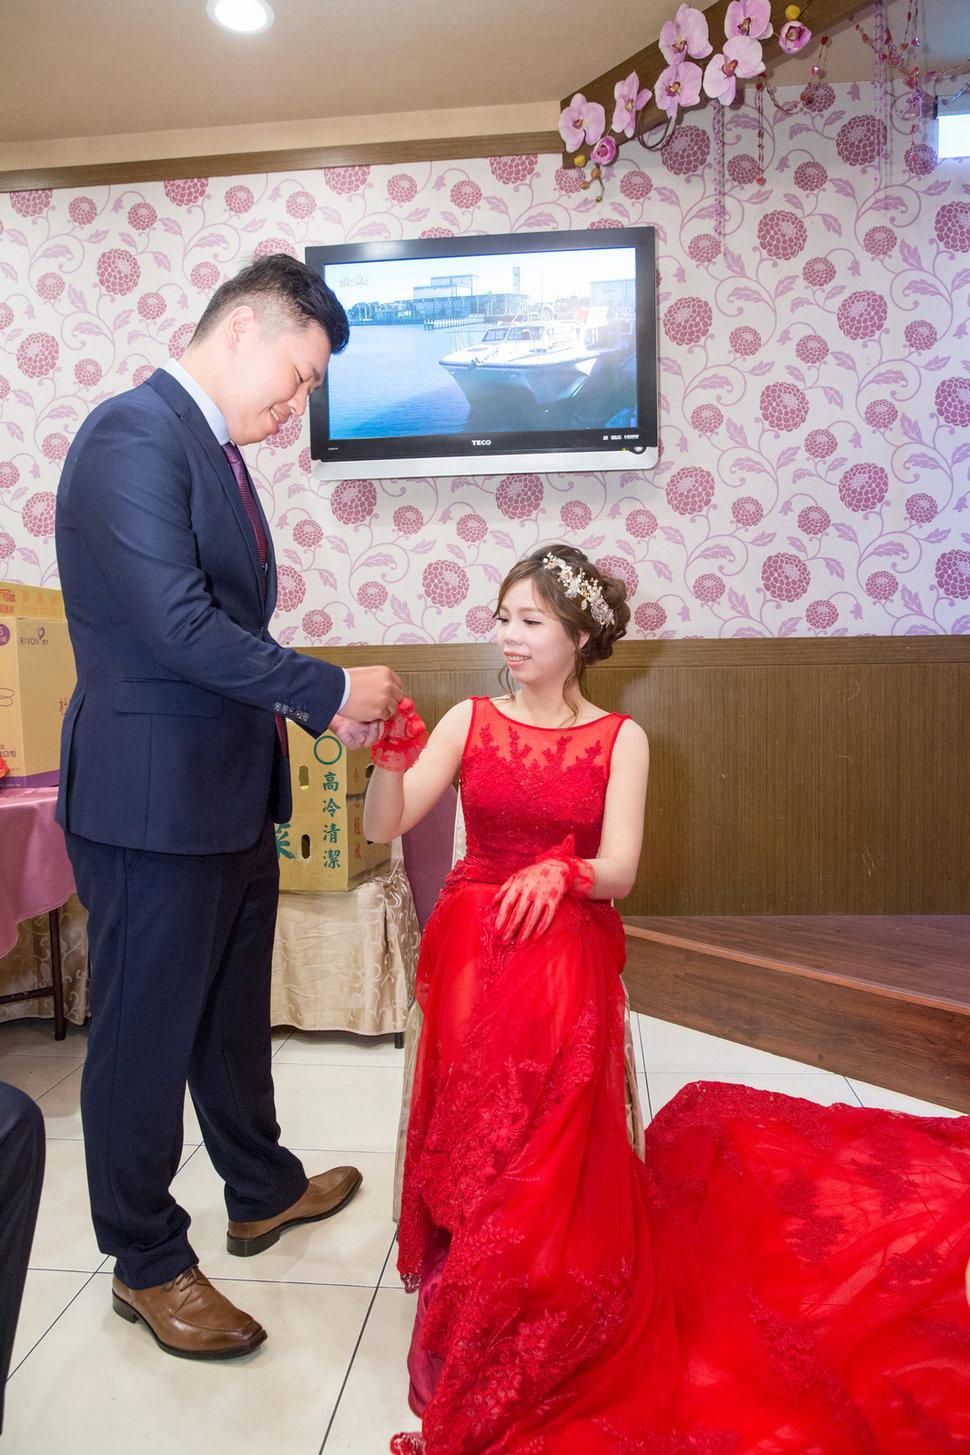 HANK9542 - 蛋拔婚禮紀錄 - 結婚吧